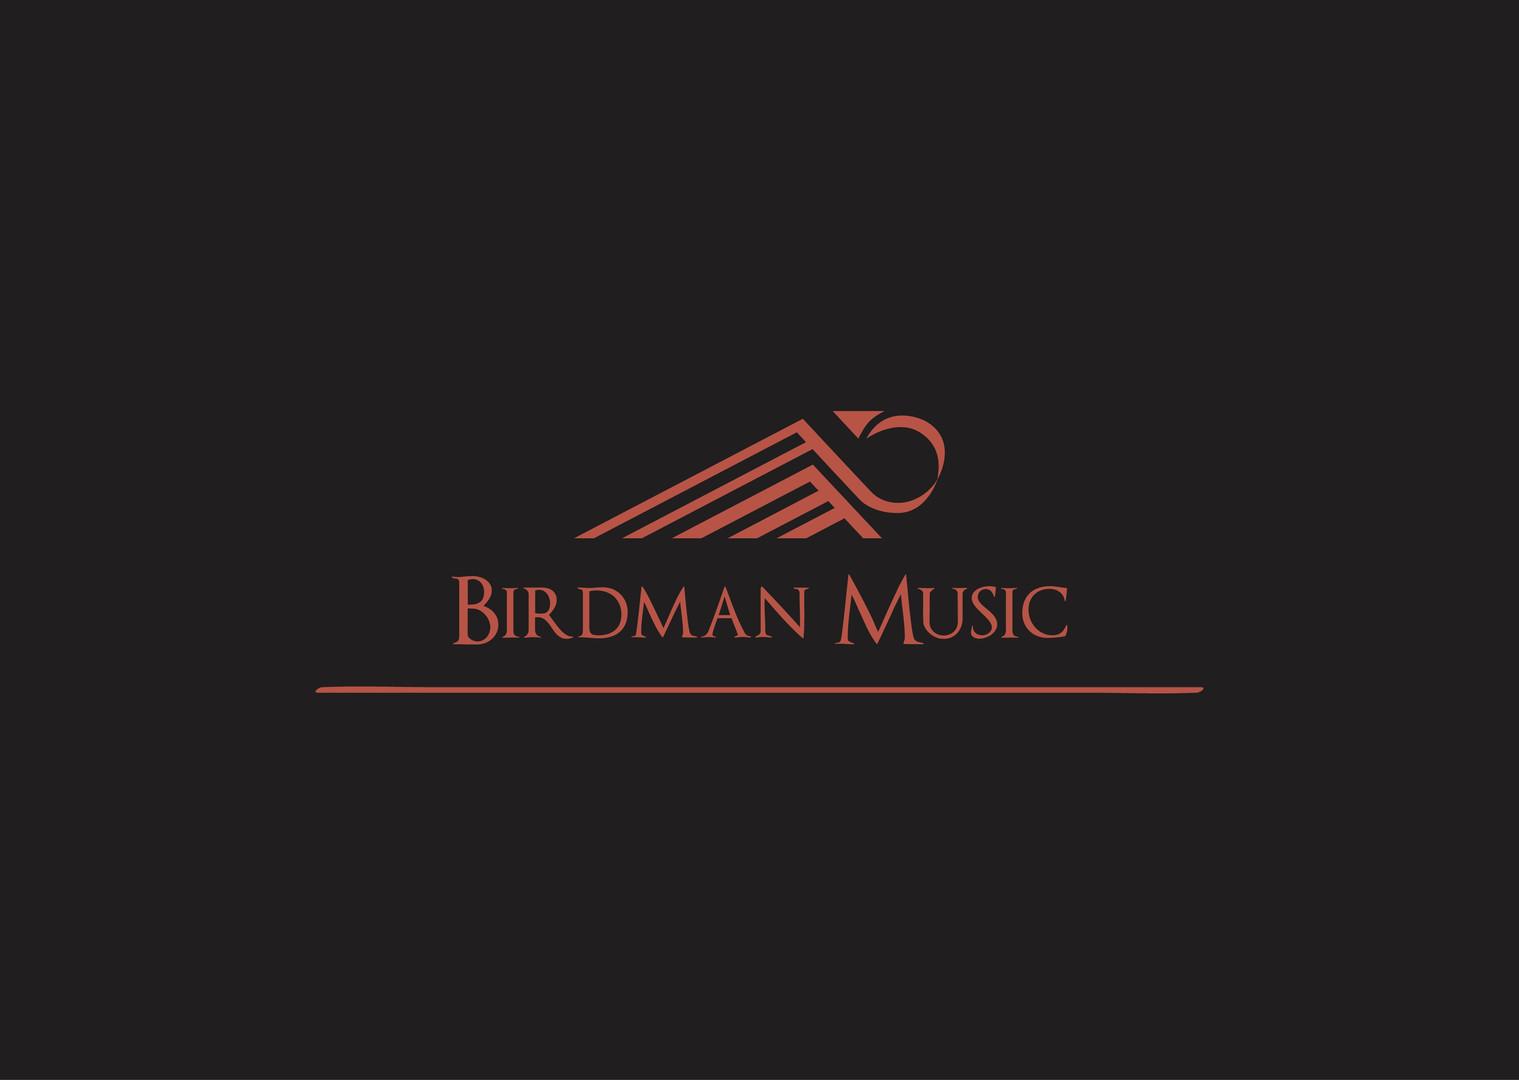 20170522 Birdman music CI-01.jp